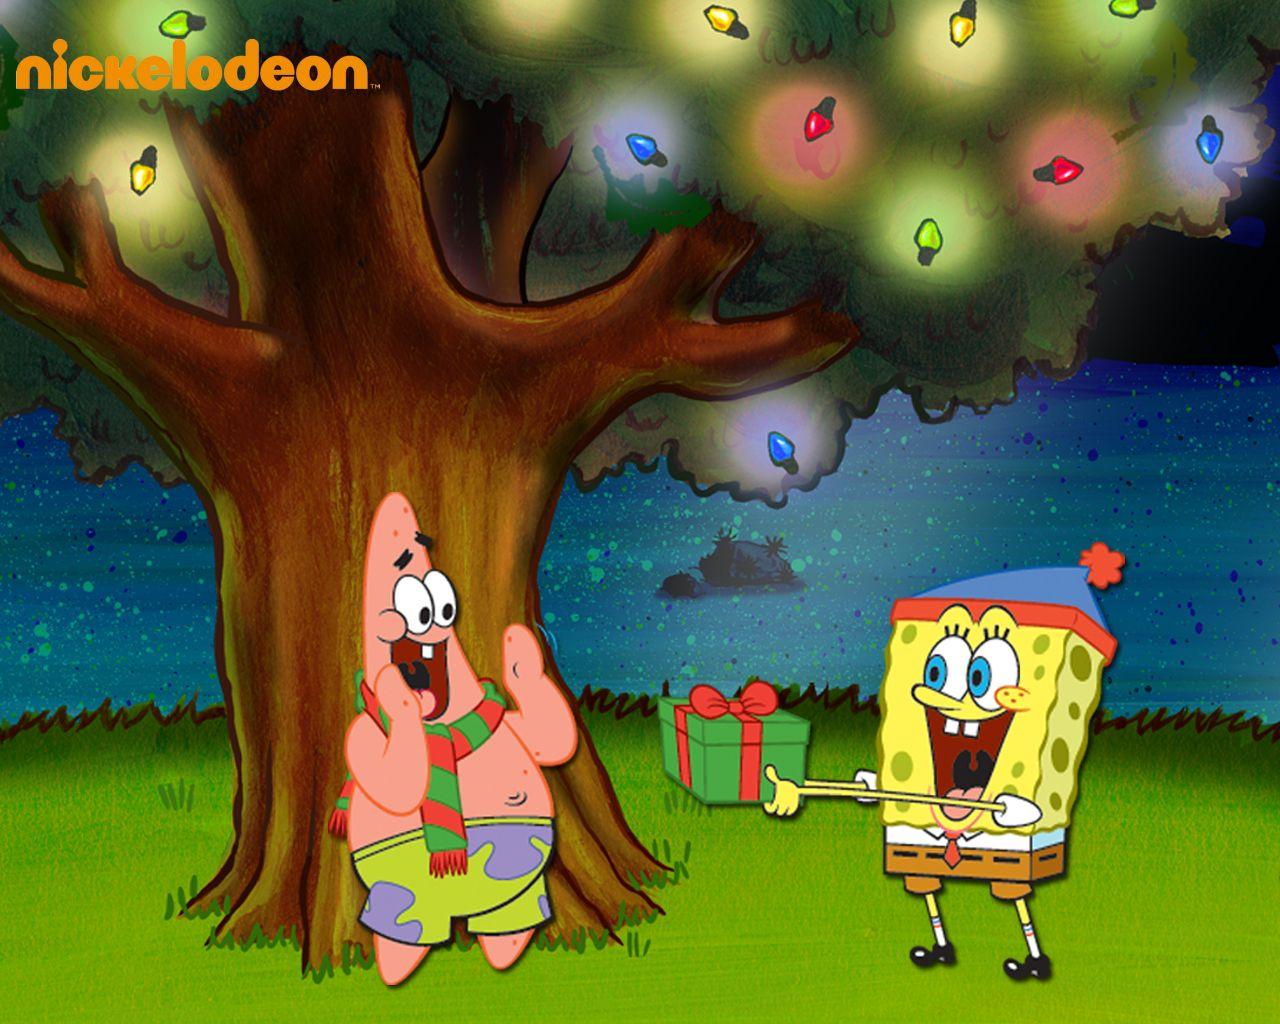 Spongebob and Patrick Christmas wallpaper patrick star spongebob 40617334 1280 1024